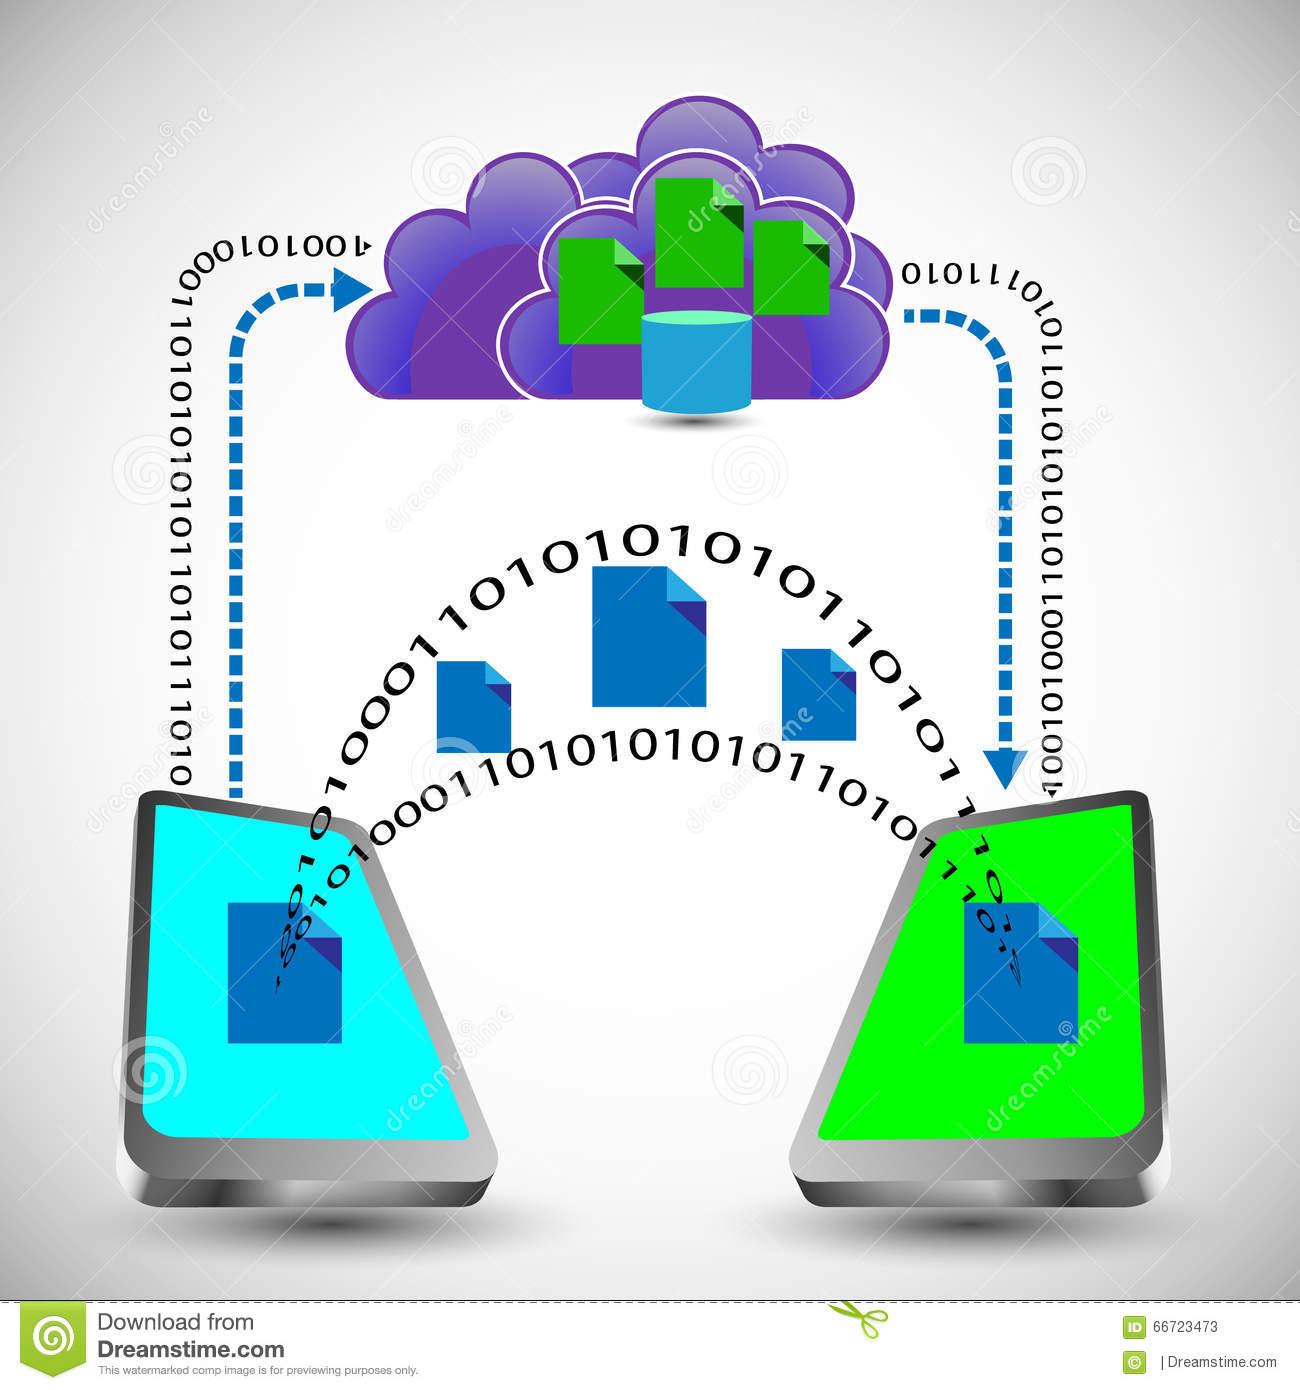 Data Exchange On Mobile. Royalty Free Stock Image.